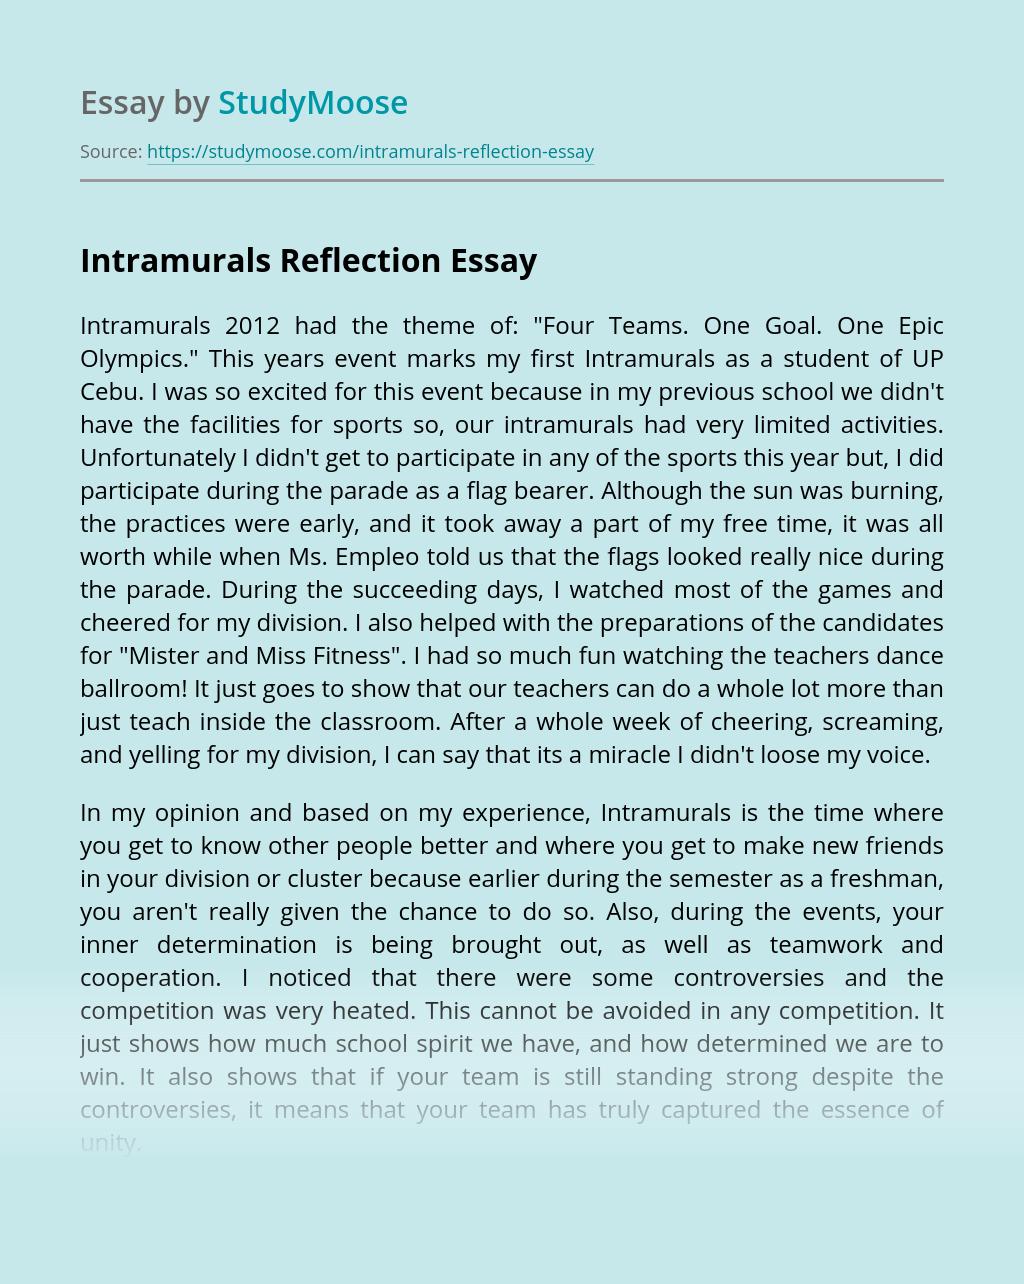 Intramurals Reflection